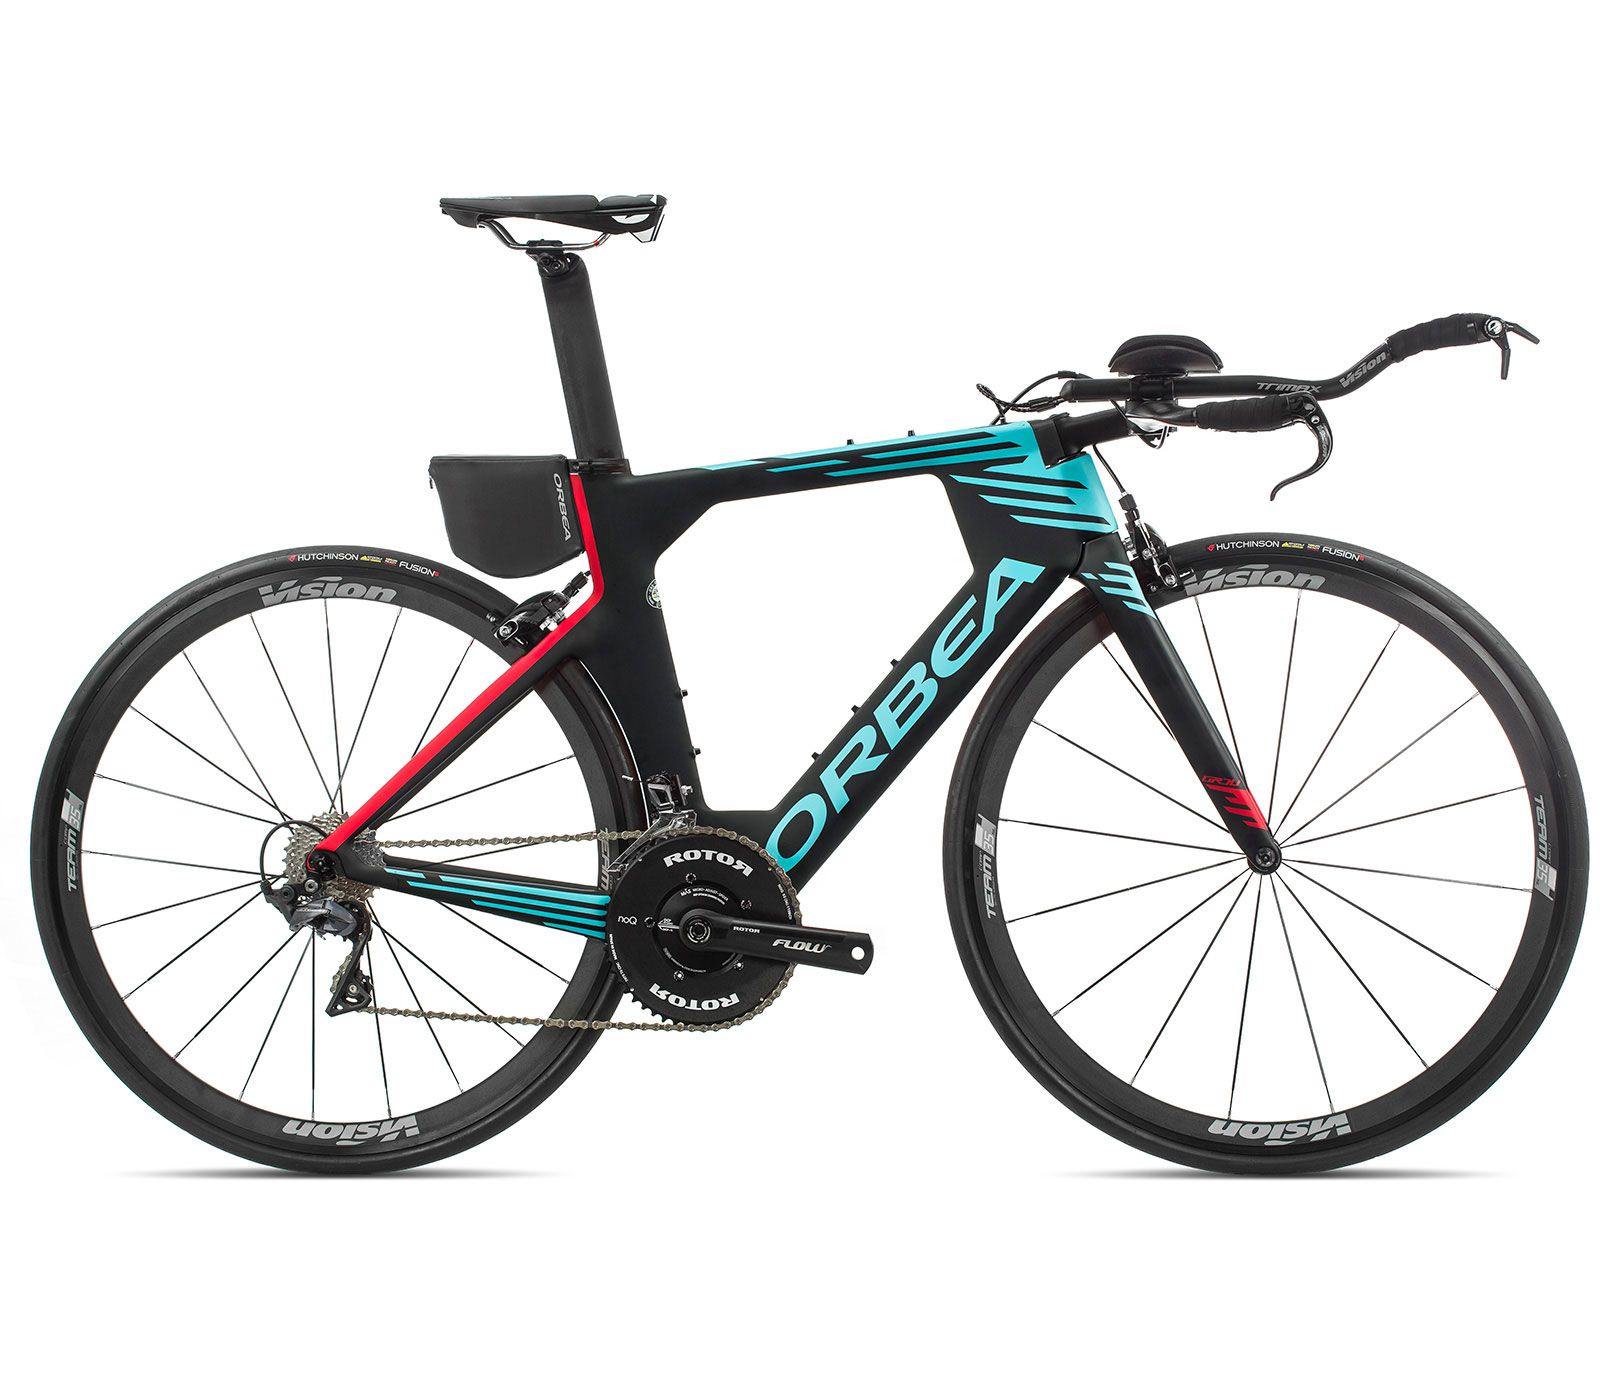 Bicicleta Triathlon Orbea ORDU M20TEAM Tam M Preta/Azul - 2020